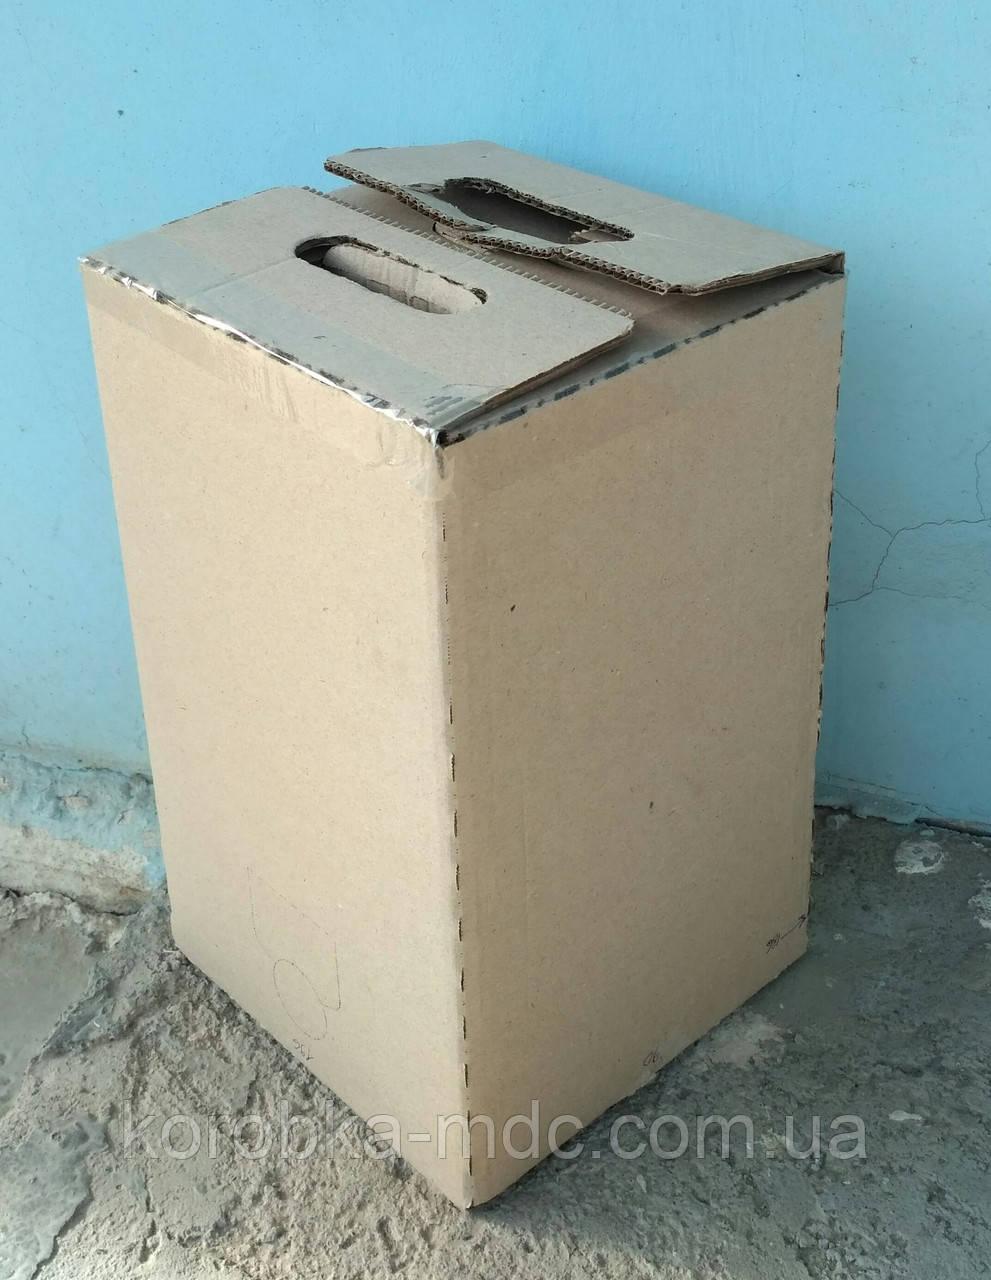 Коробка для пакета 10 л  автоматичесих линий розлива жидкостей, масел и концентратов BAG in BOX